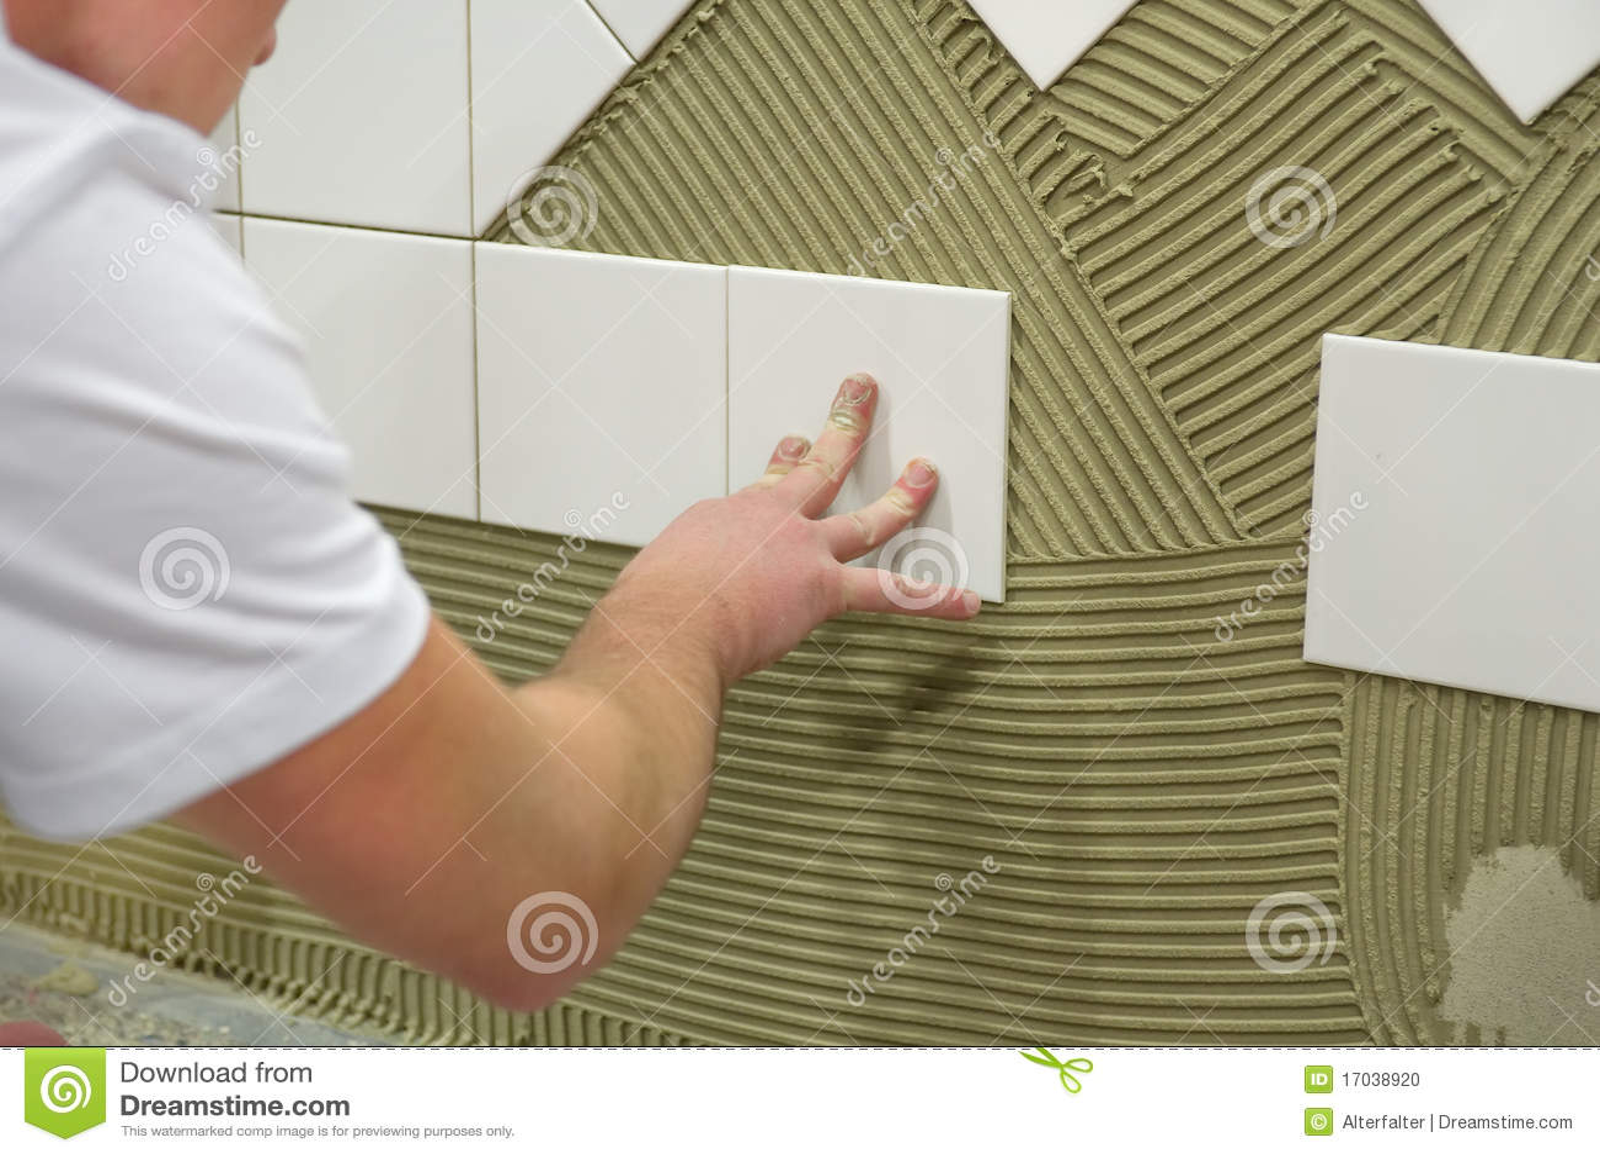 Wall Tile Glue Stock Photo Image Of Adhesive Tile